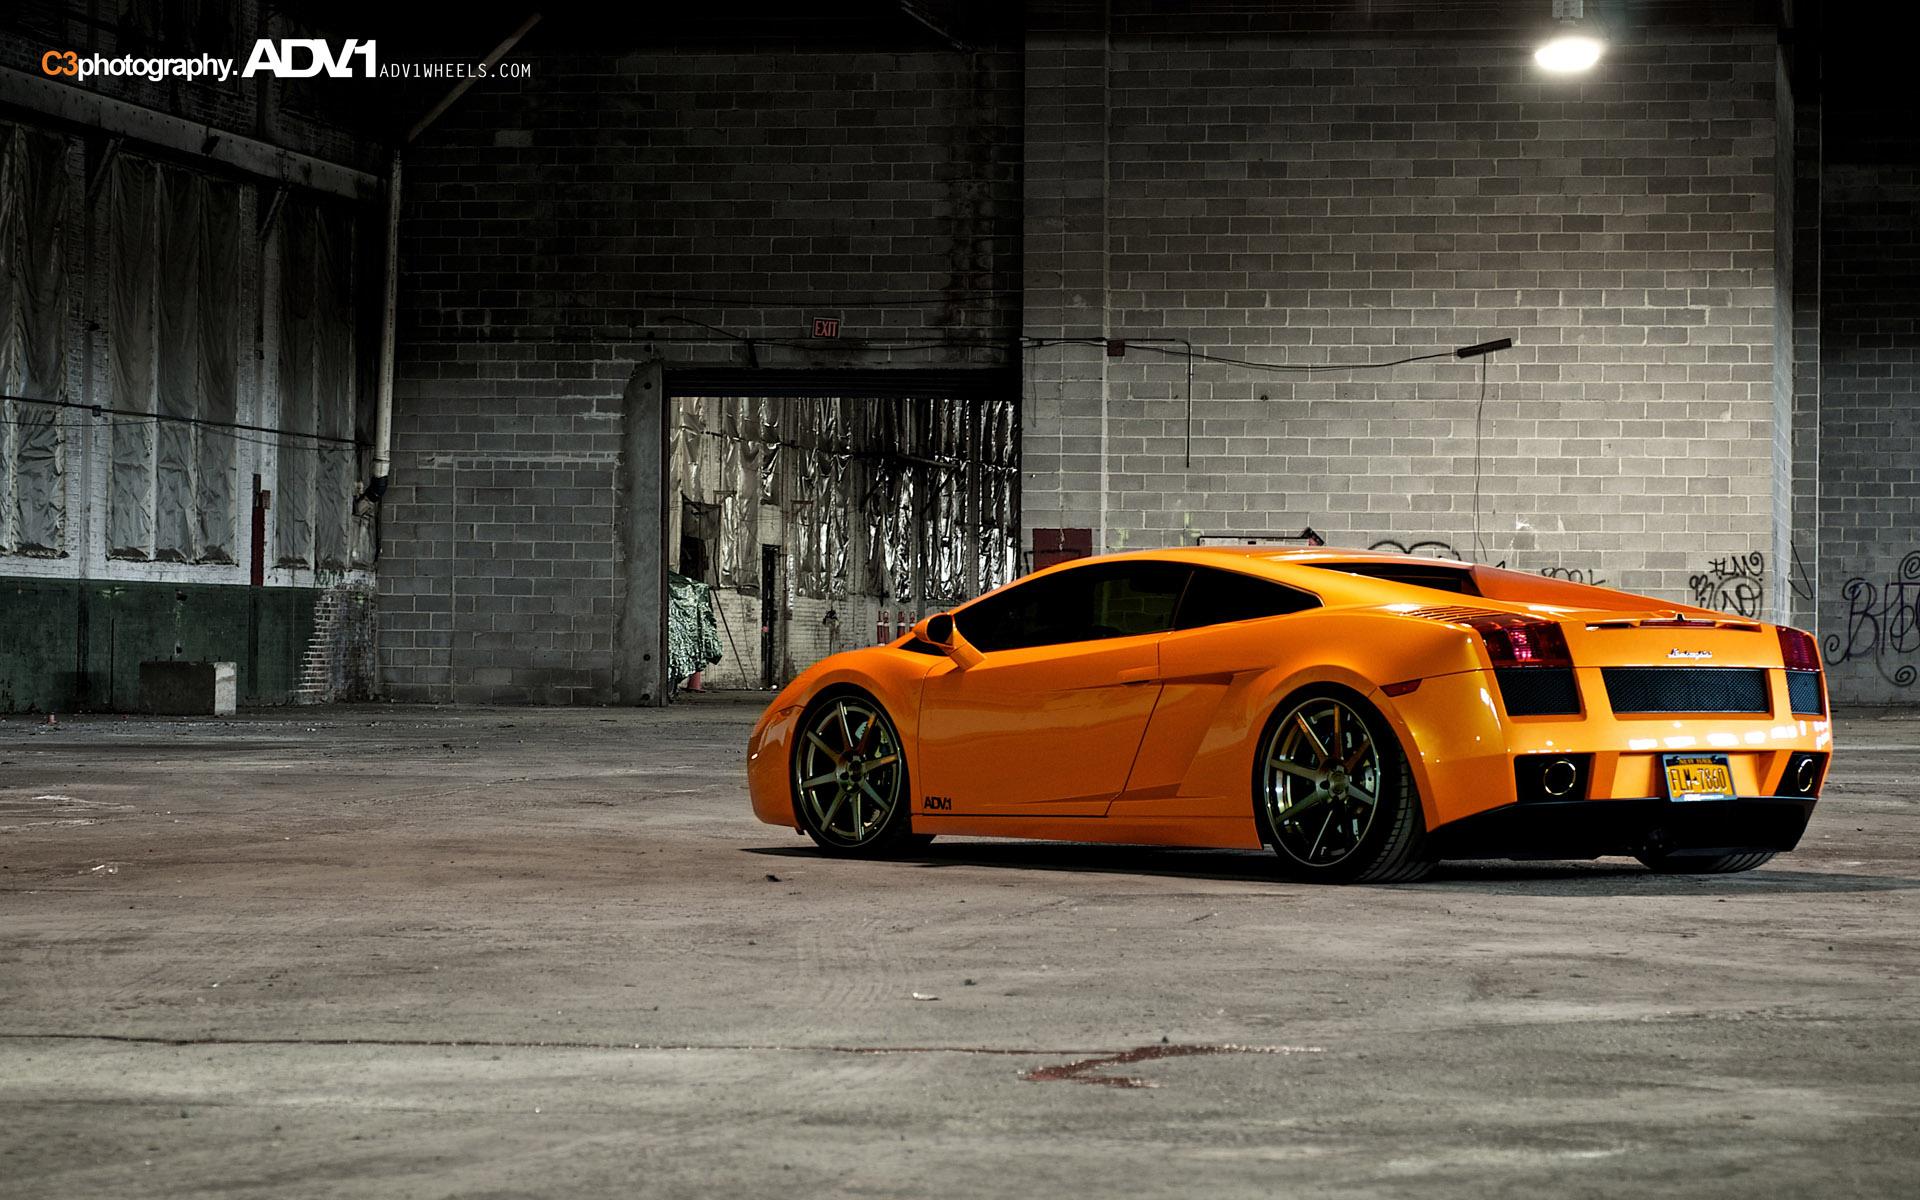 Hd Wallpaper Adv 1 Wheels Lamborghini Gallardo For Ipad Pictures to ...